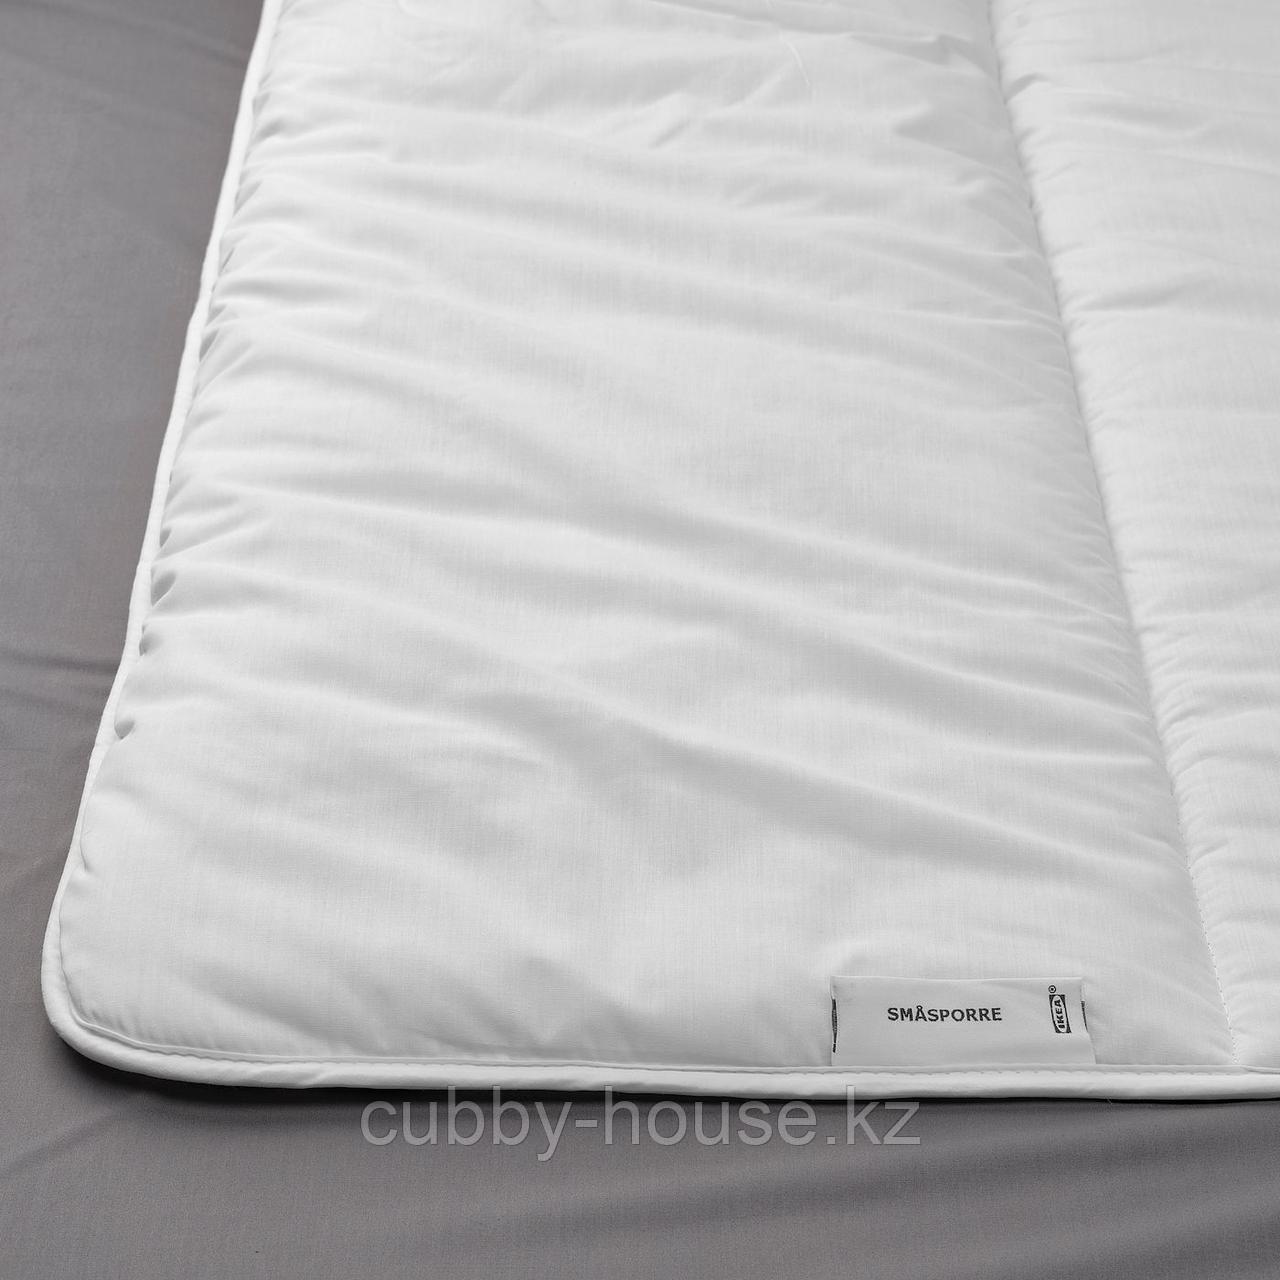 СМОСПОРРЕ Одеяло очень теплое, 150x200 см